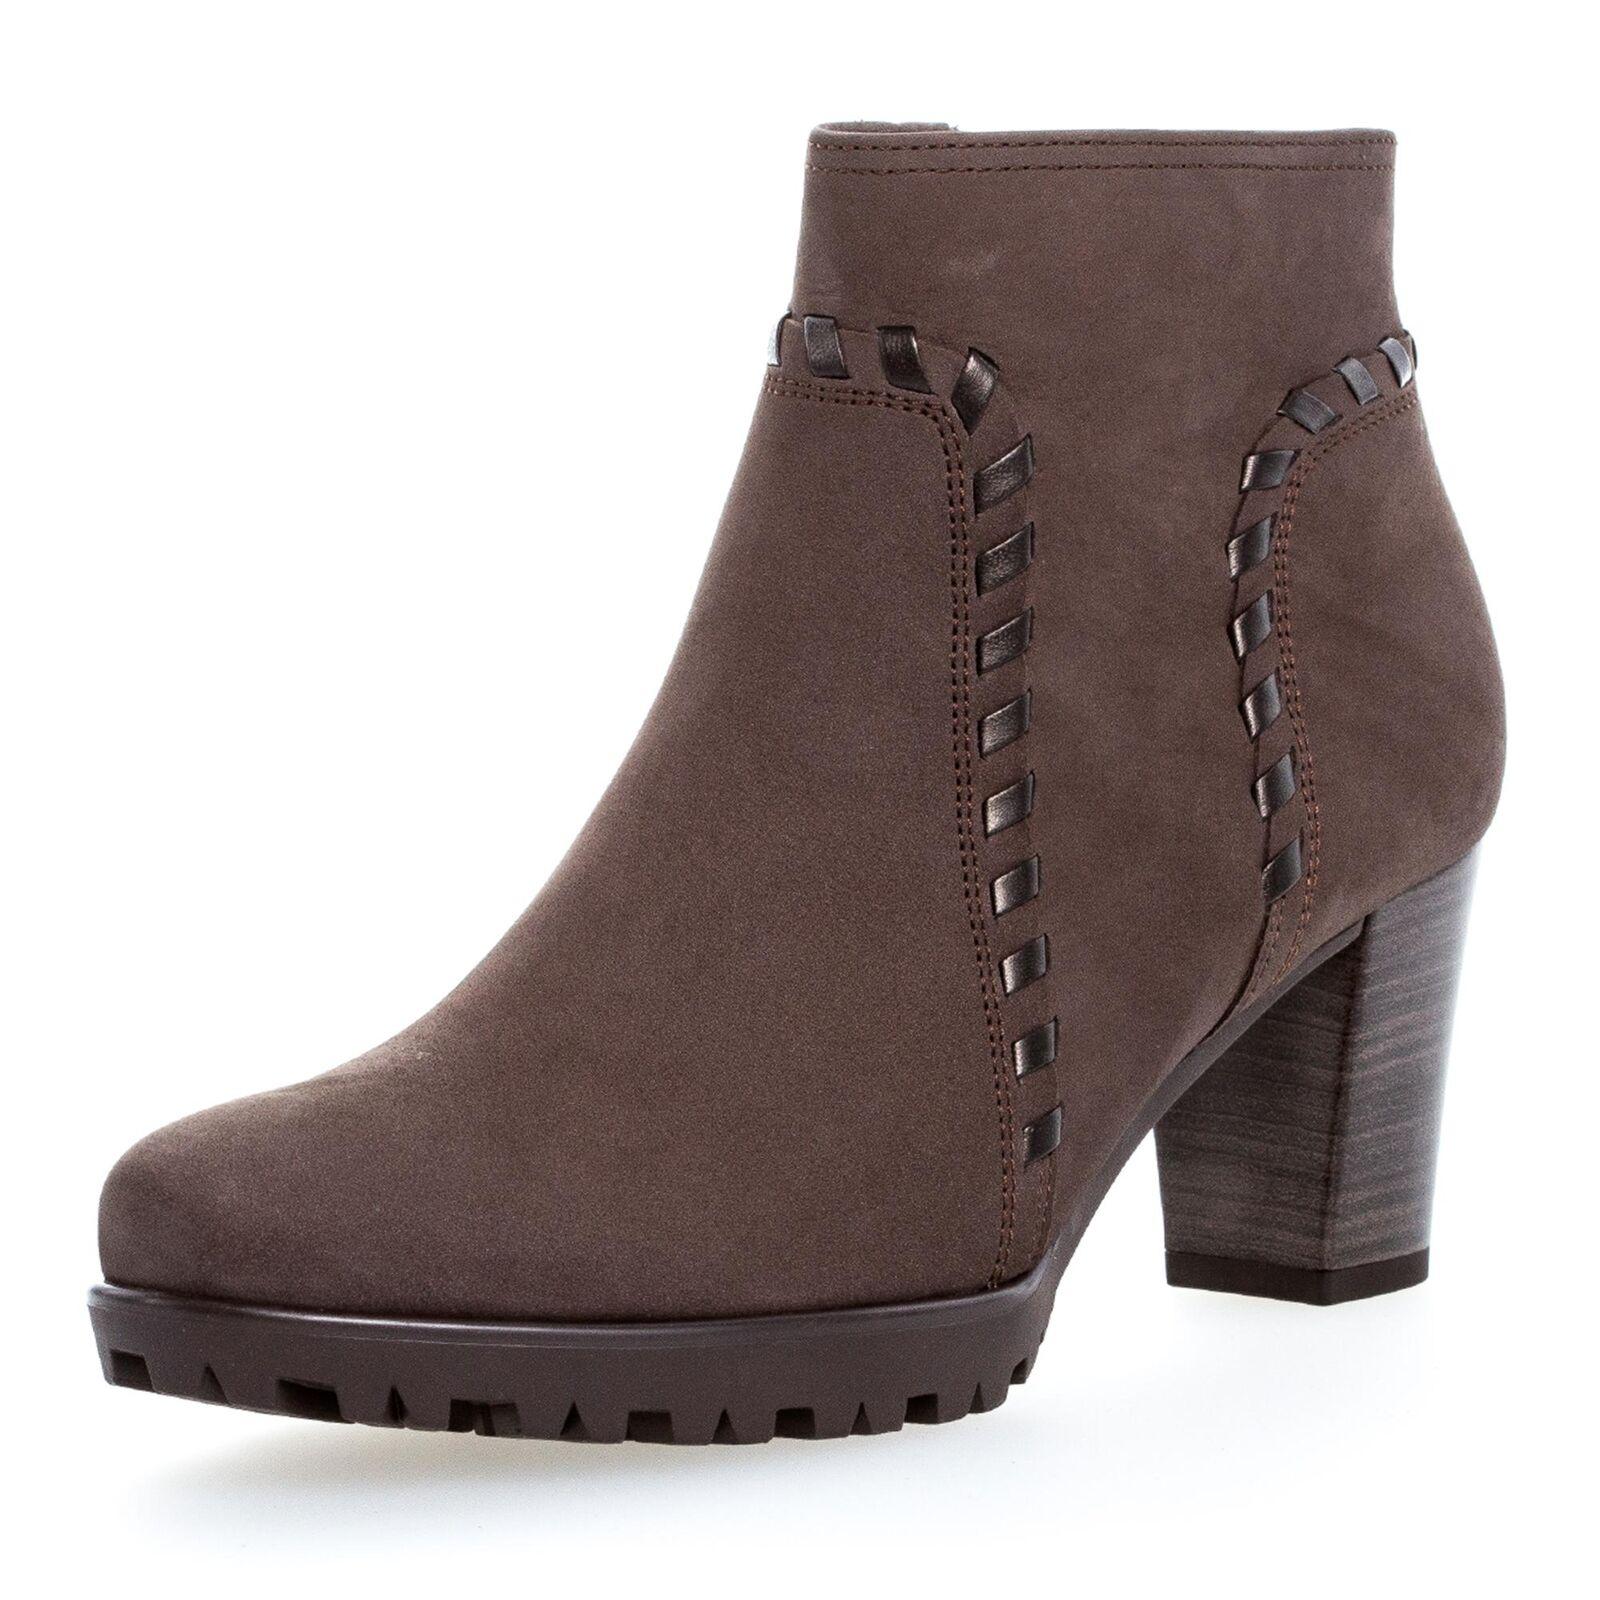 Gabor Comfort Damen Stiefeletten Trotteurs Ancle Stiefel Schuhe Echtleder taupe